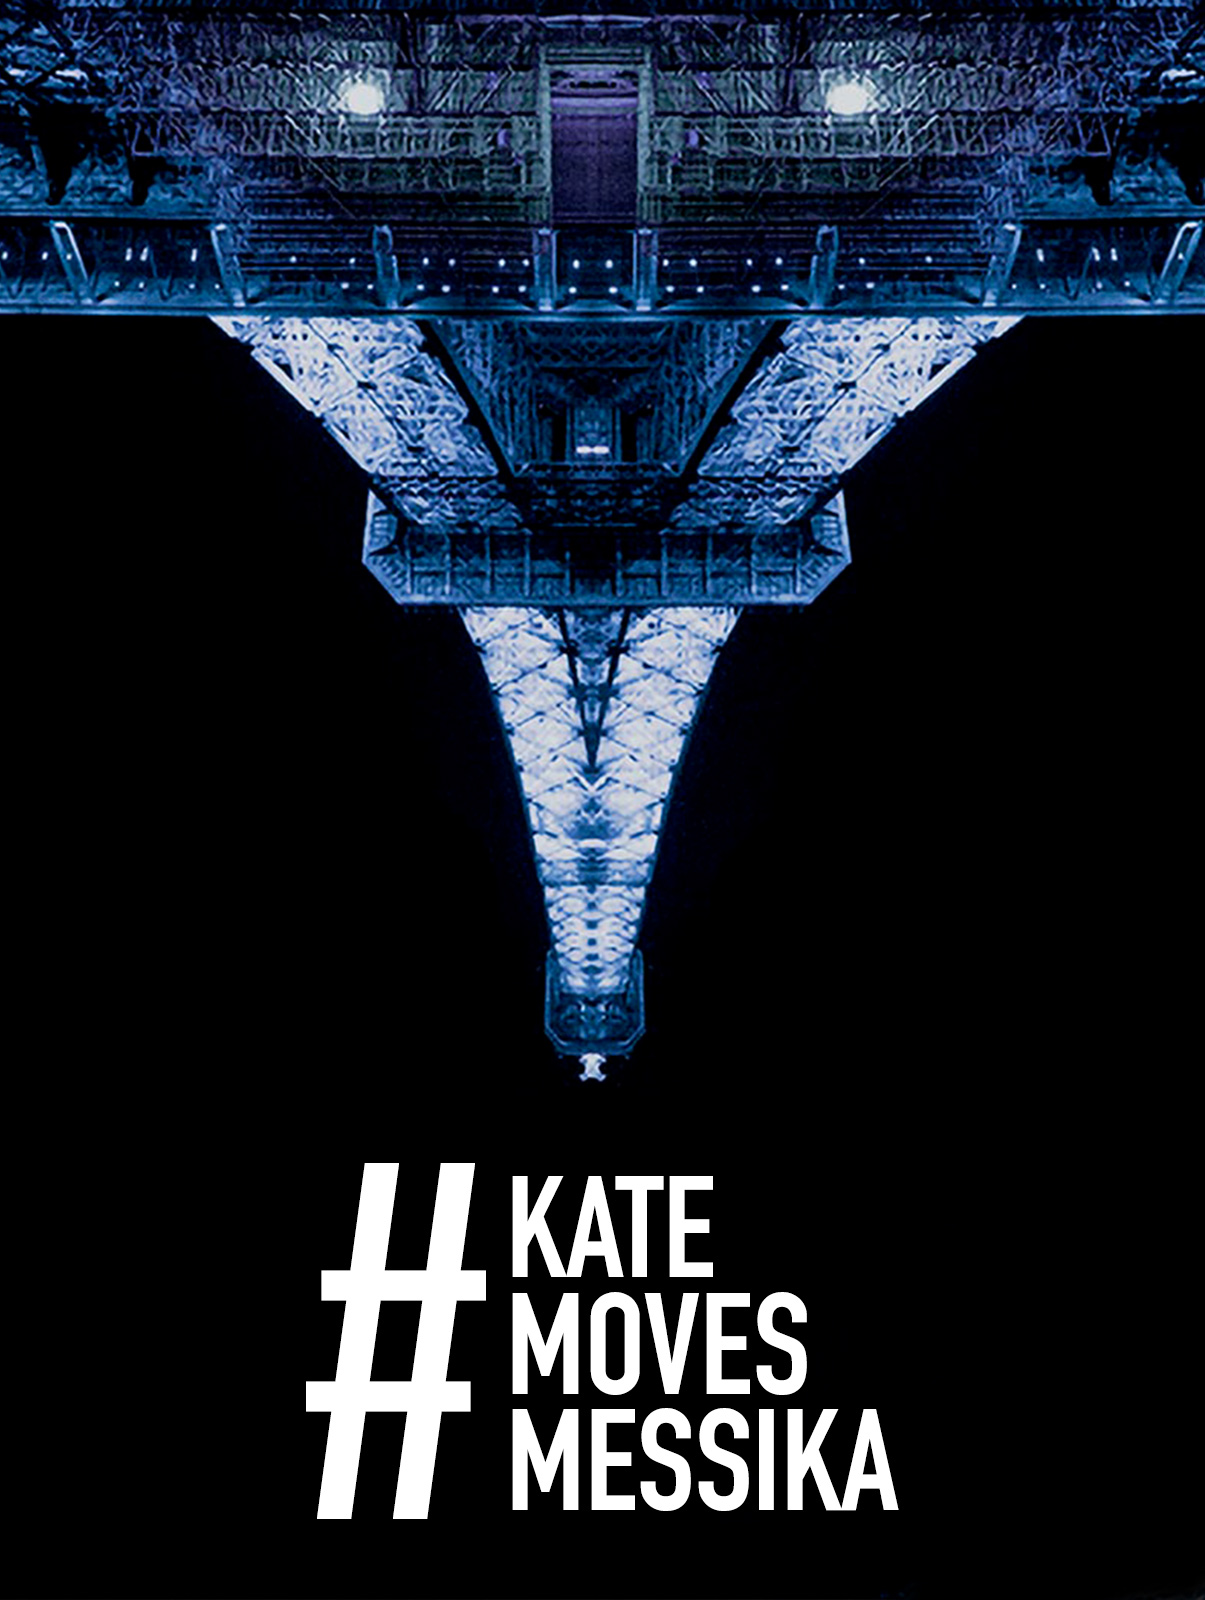 #KateMovesMessika